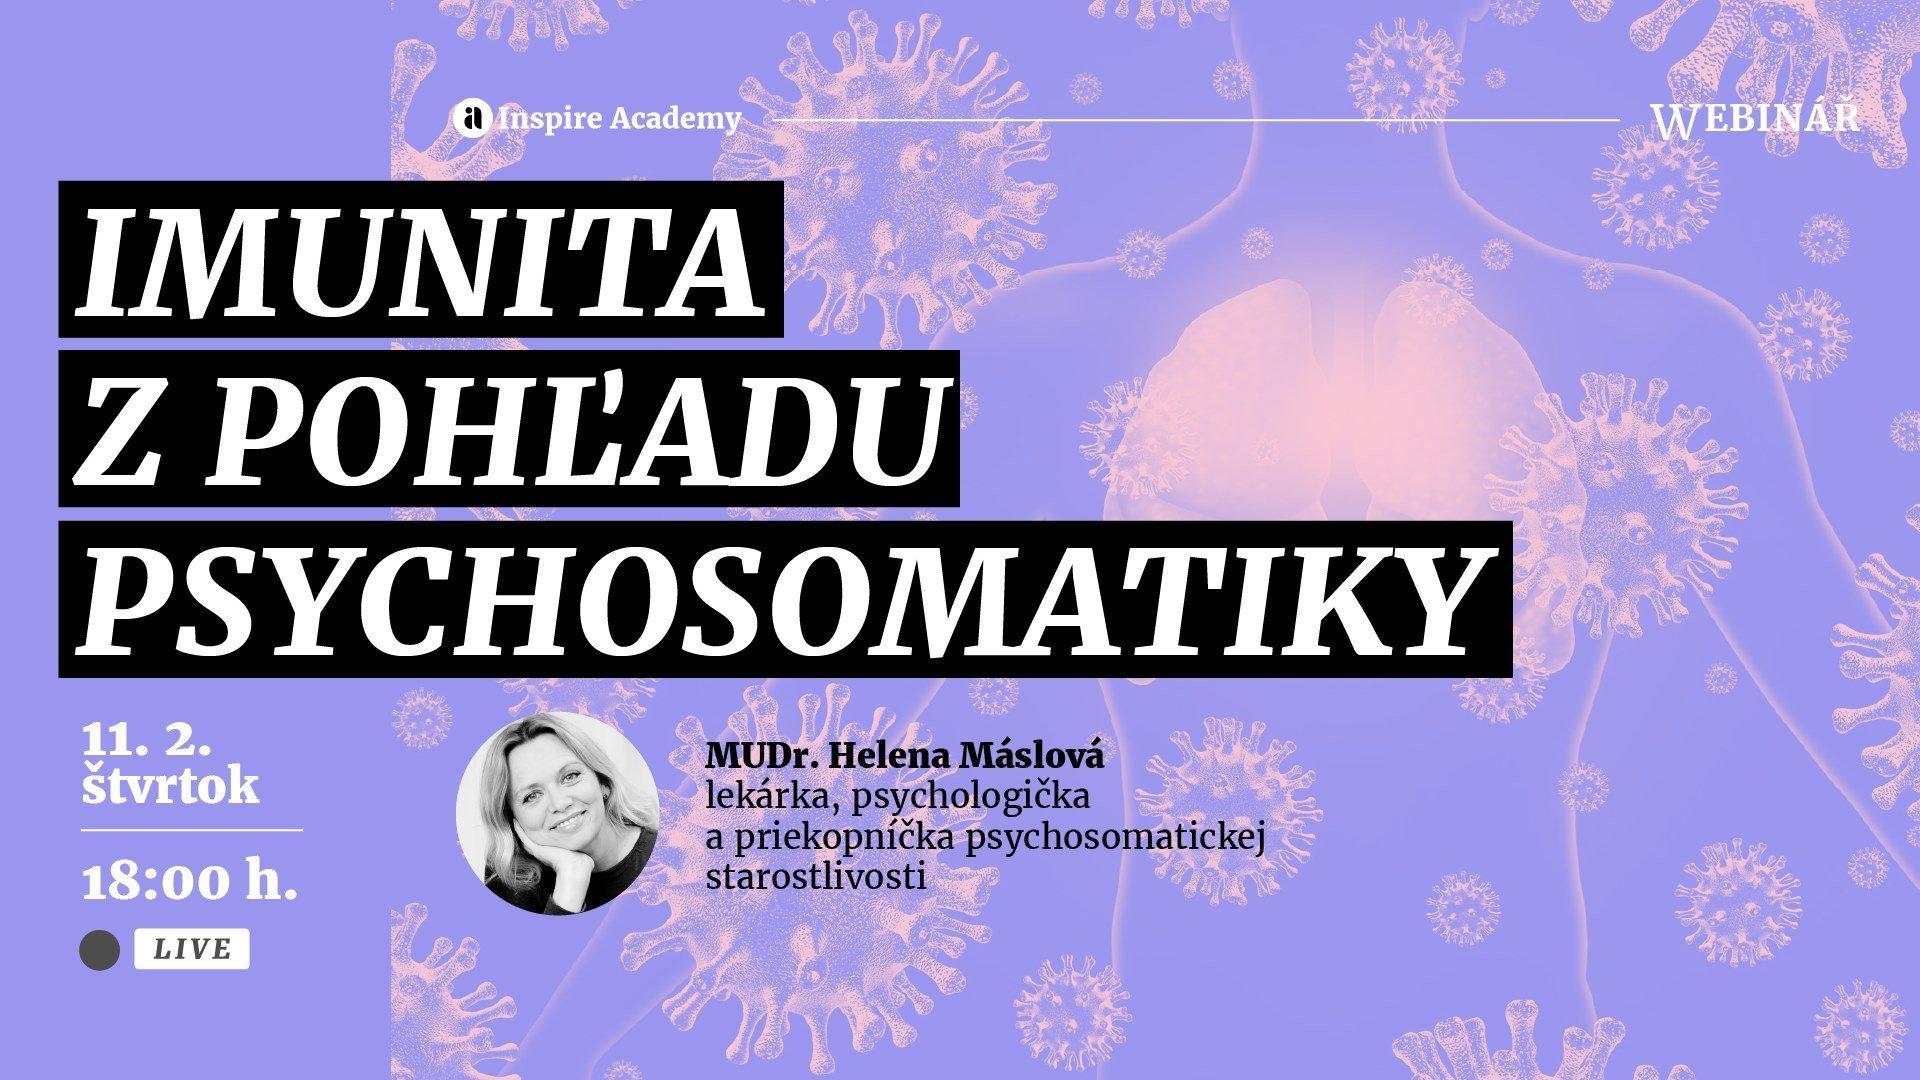 Imunita z pohľadu psychosomatiky